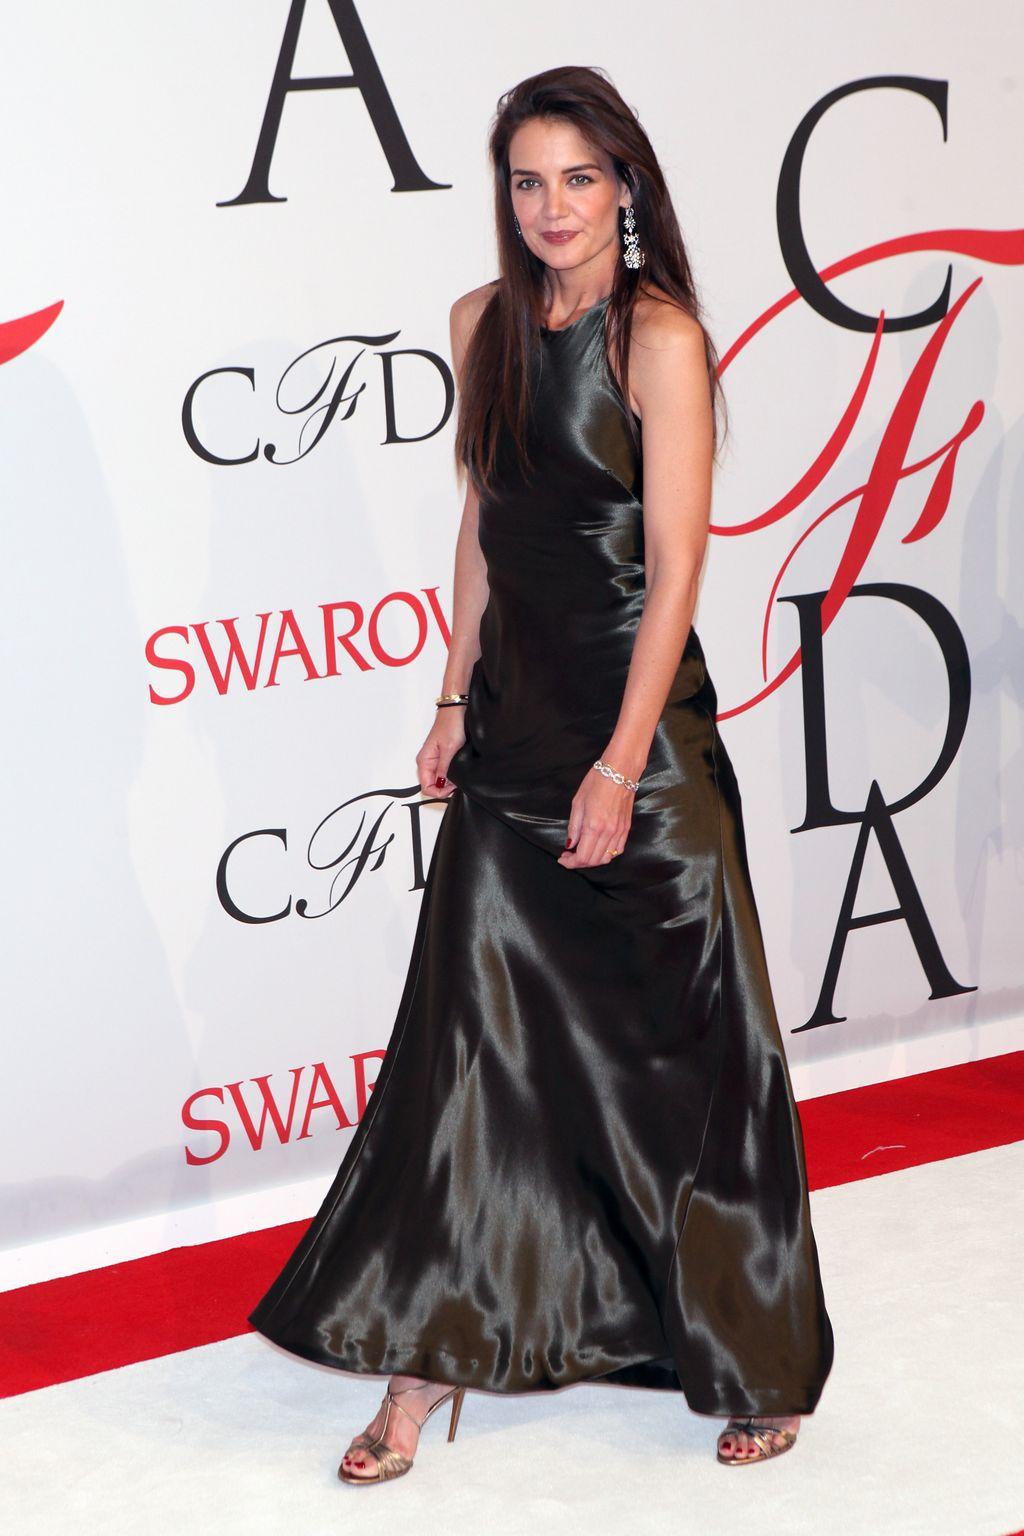 katie-holmes-in-ralph-lauren-at-2015-cfda-fashion-awards